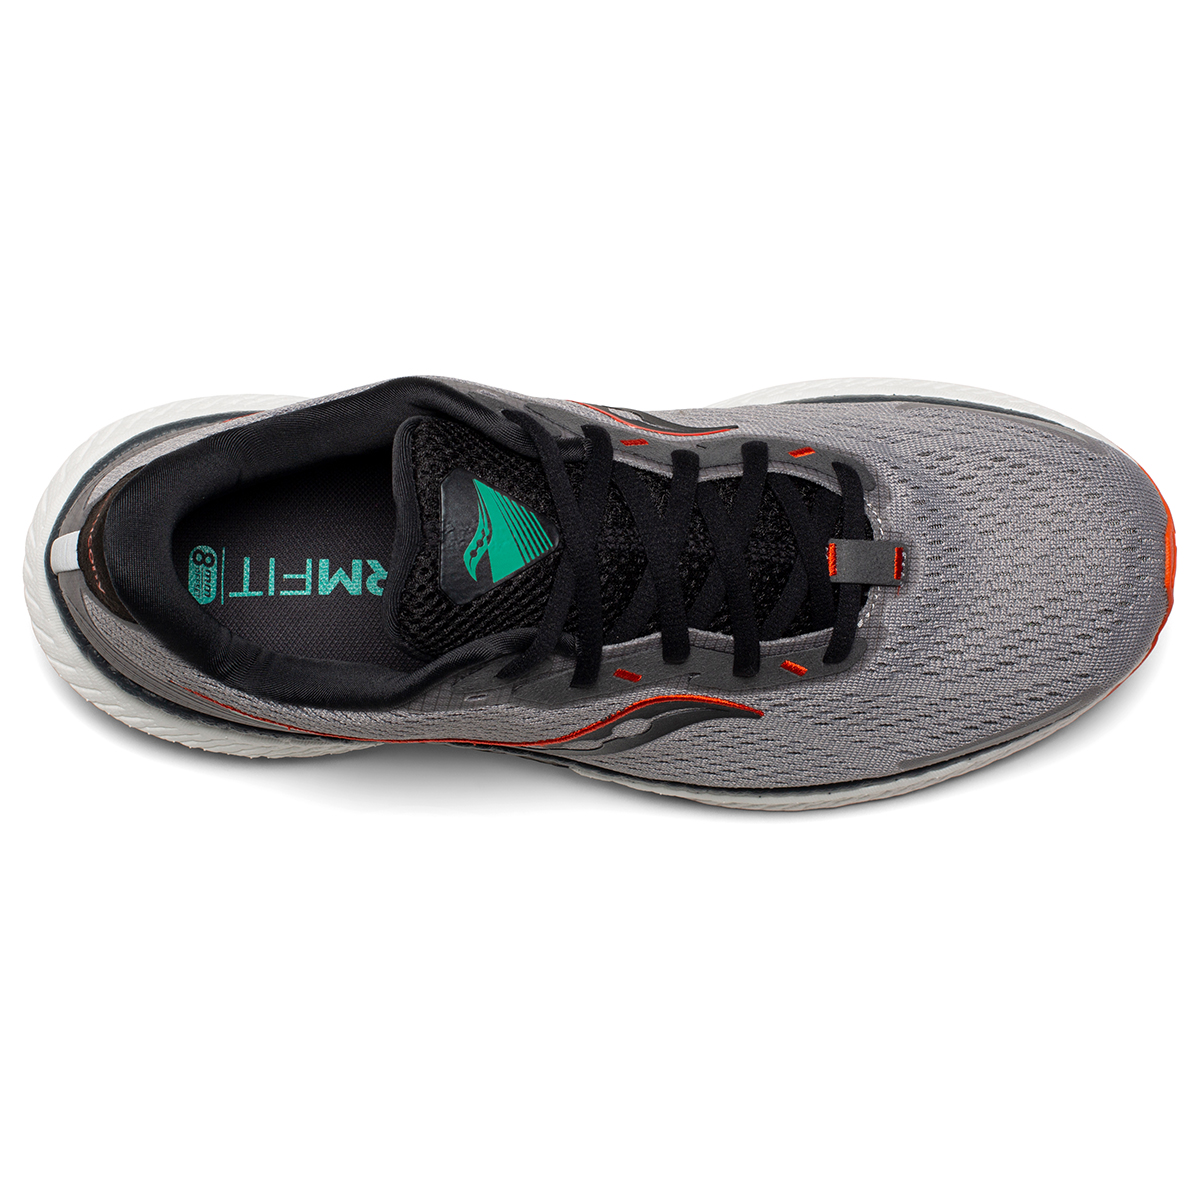 Men's Saucony Triumph 19 Running Shoe - Color: Alloy / Fire - Size: 7 - Width: Wide, Alloy / Fire, large, image 2